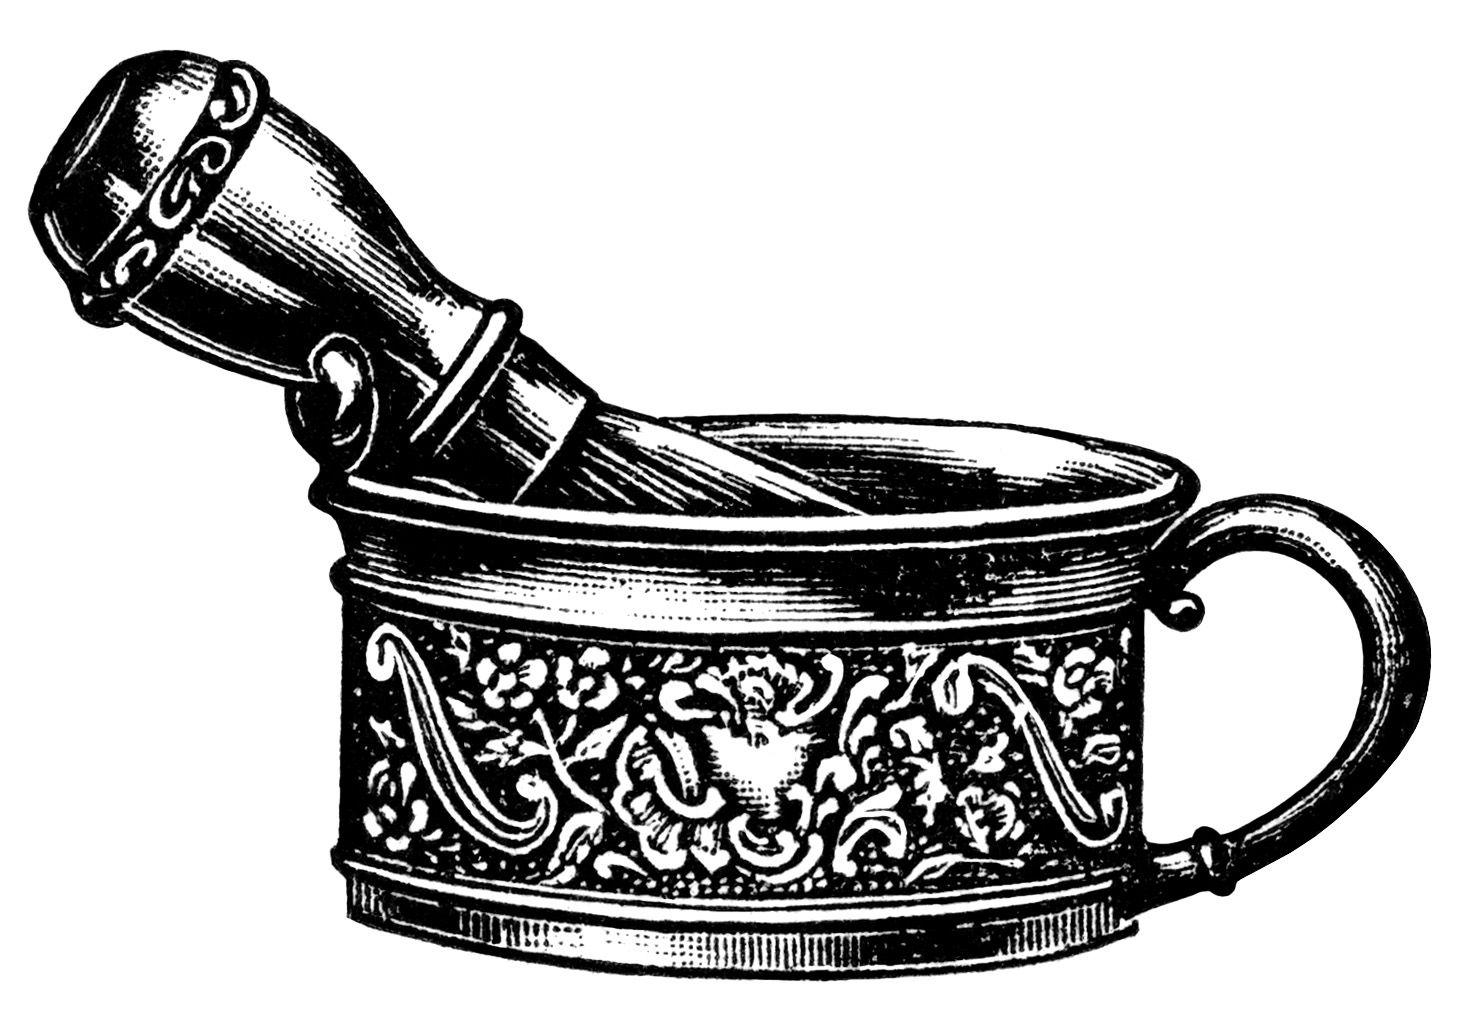 Bath clipart victorian. Men s shaving mug